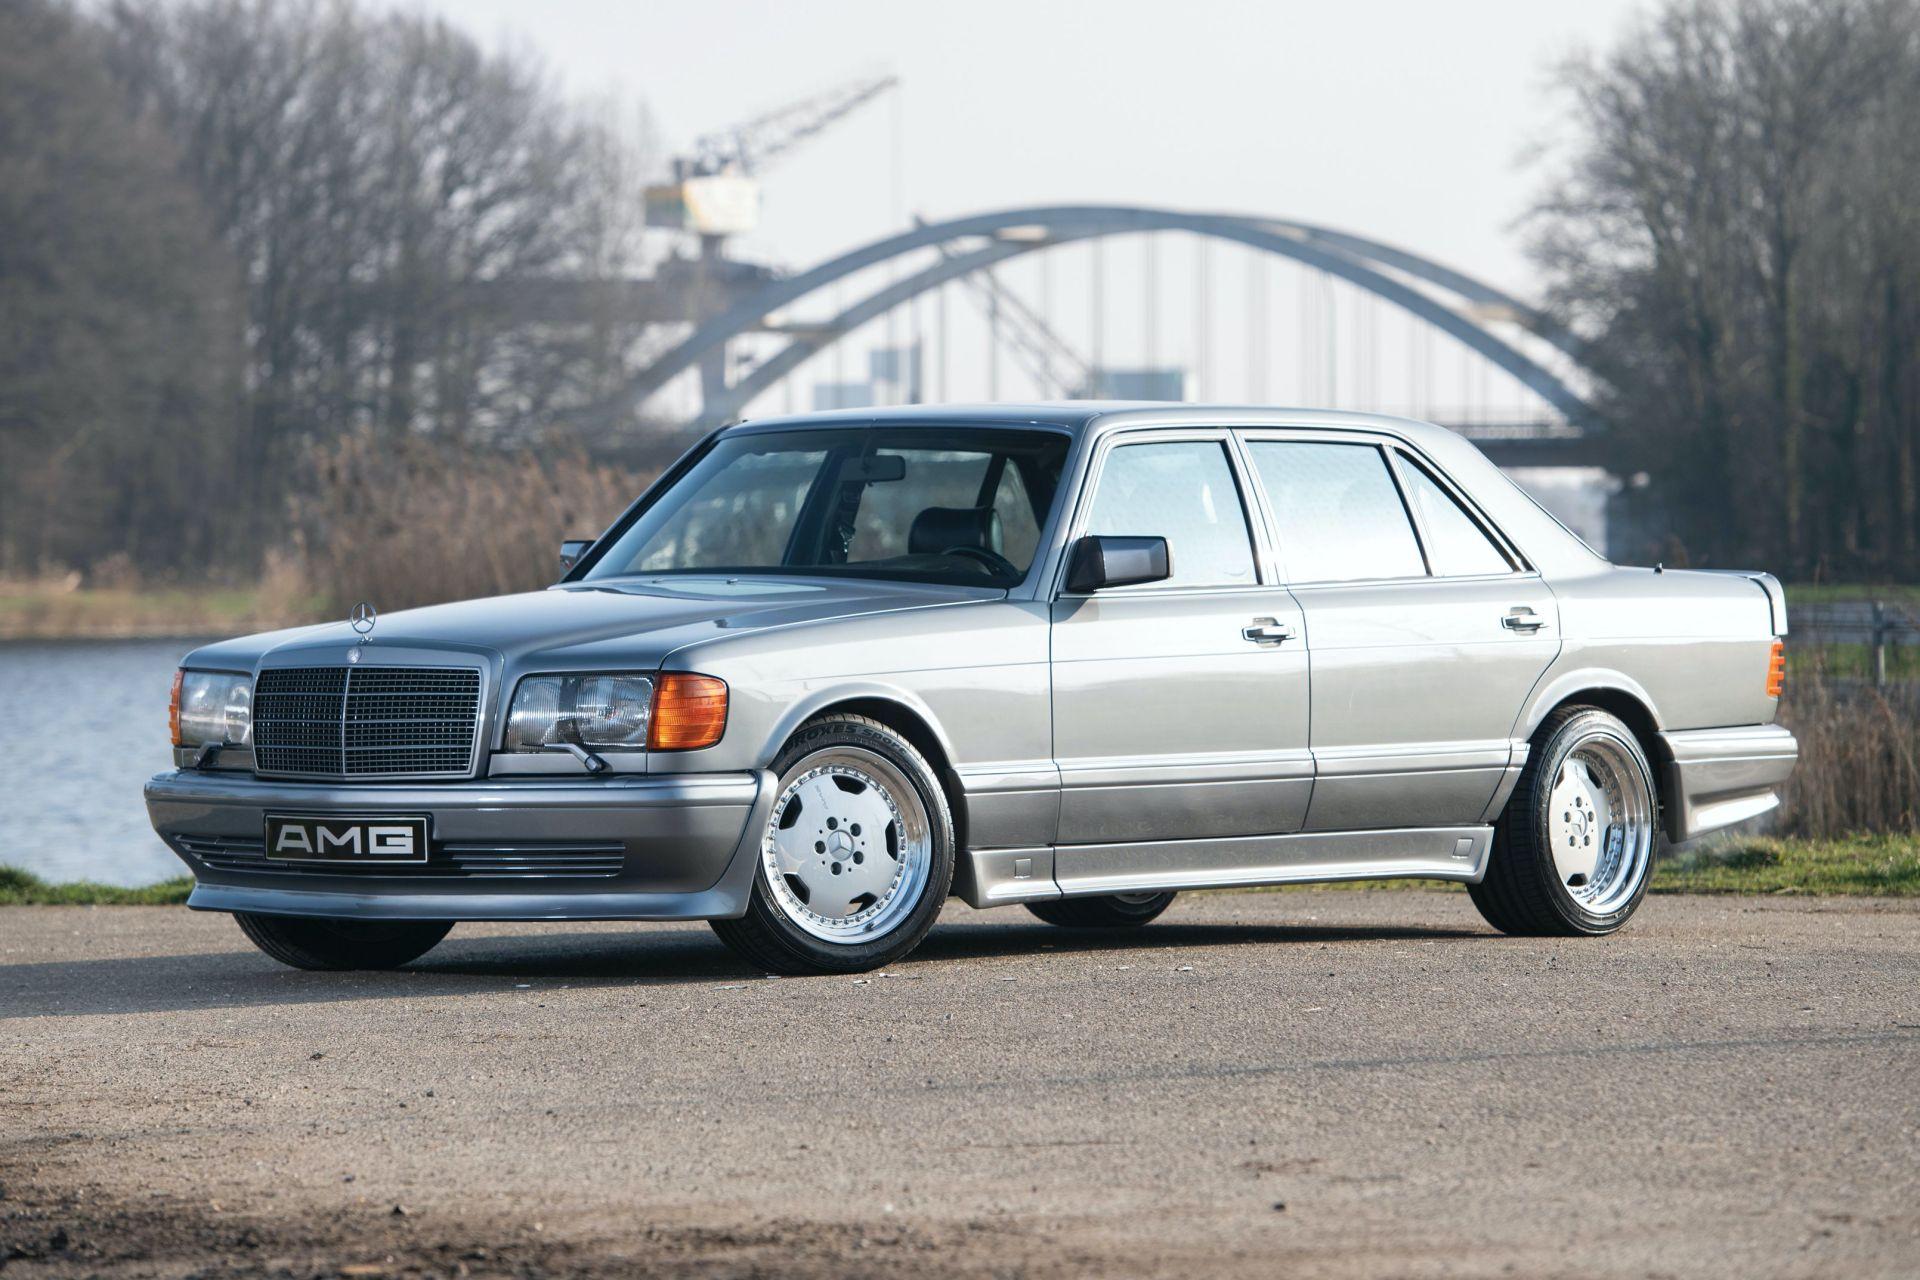 Mercedes-Benz 560 SEL AMG